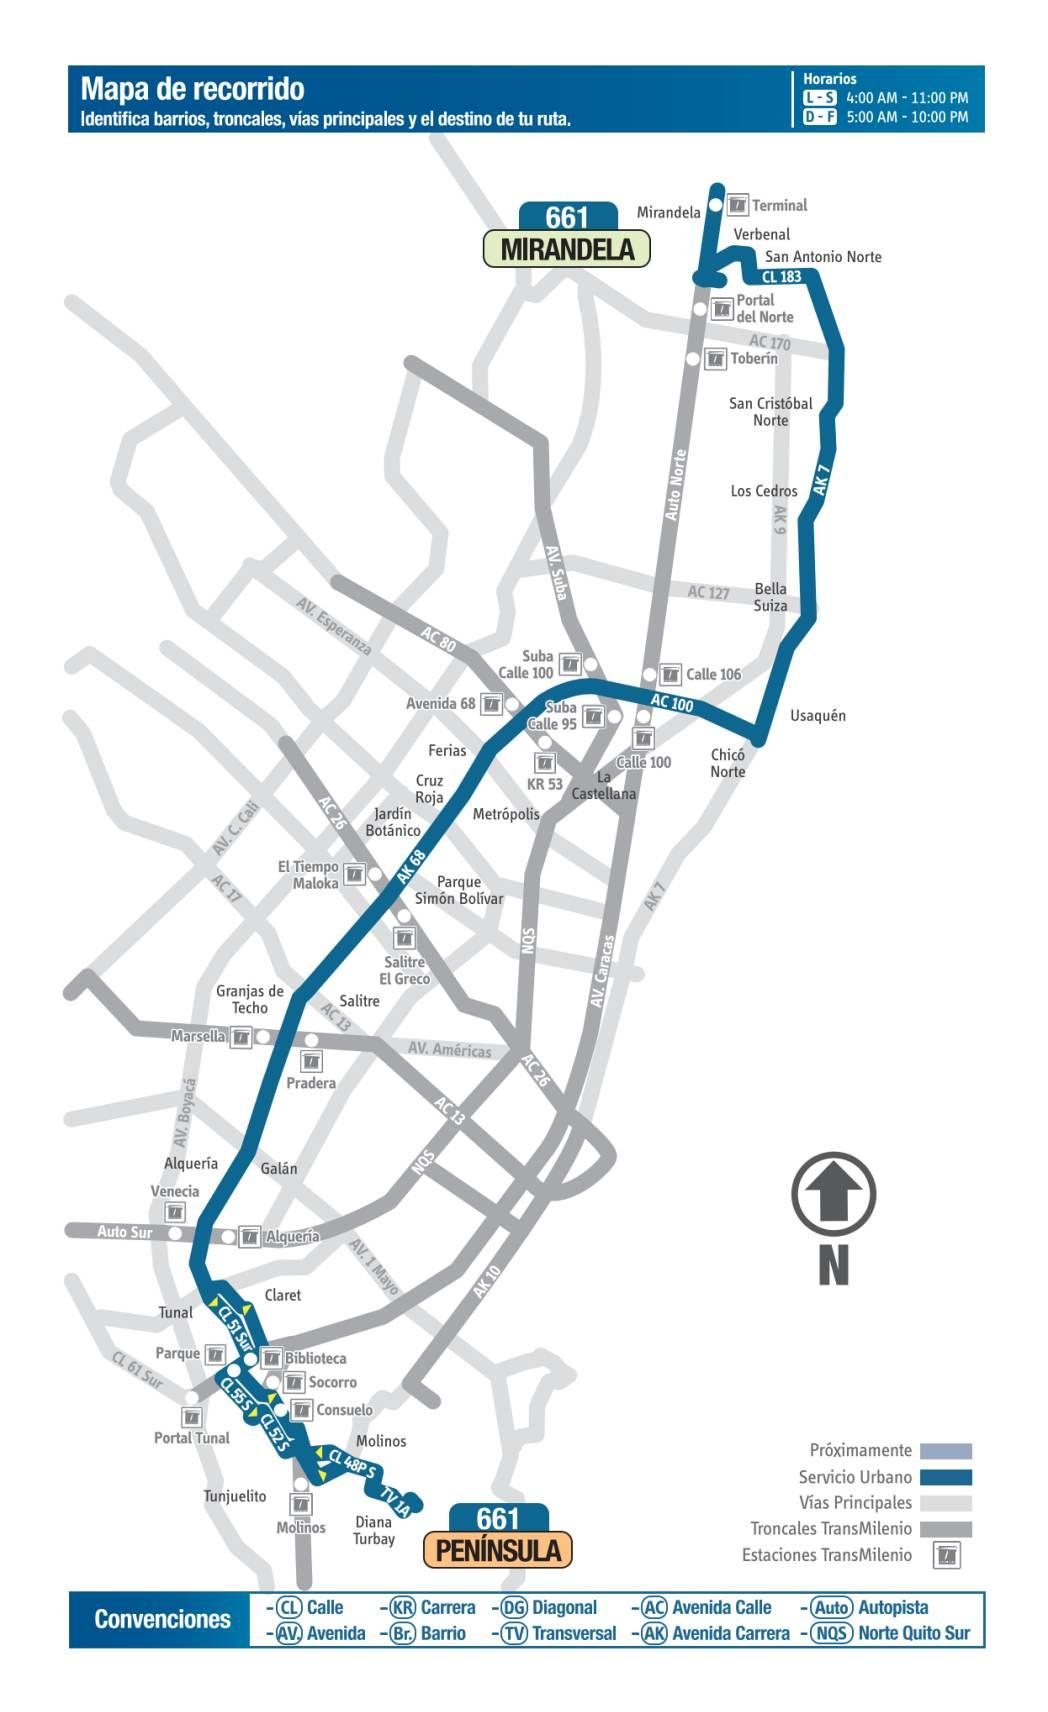 661 Península - Mirandela, mapa bus urbano Bogotá